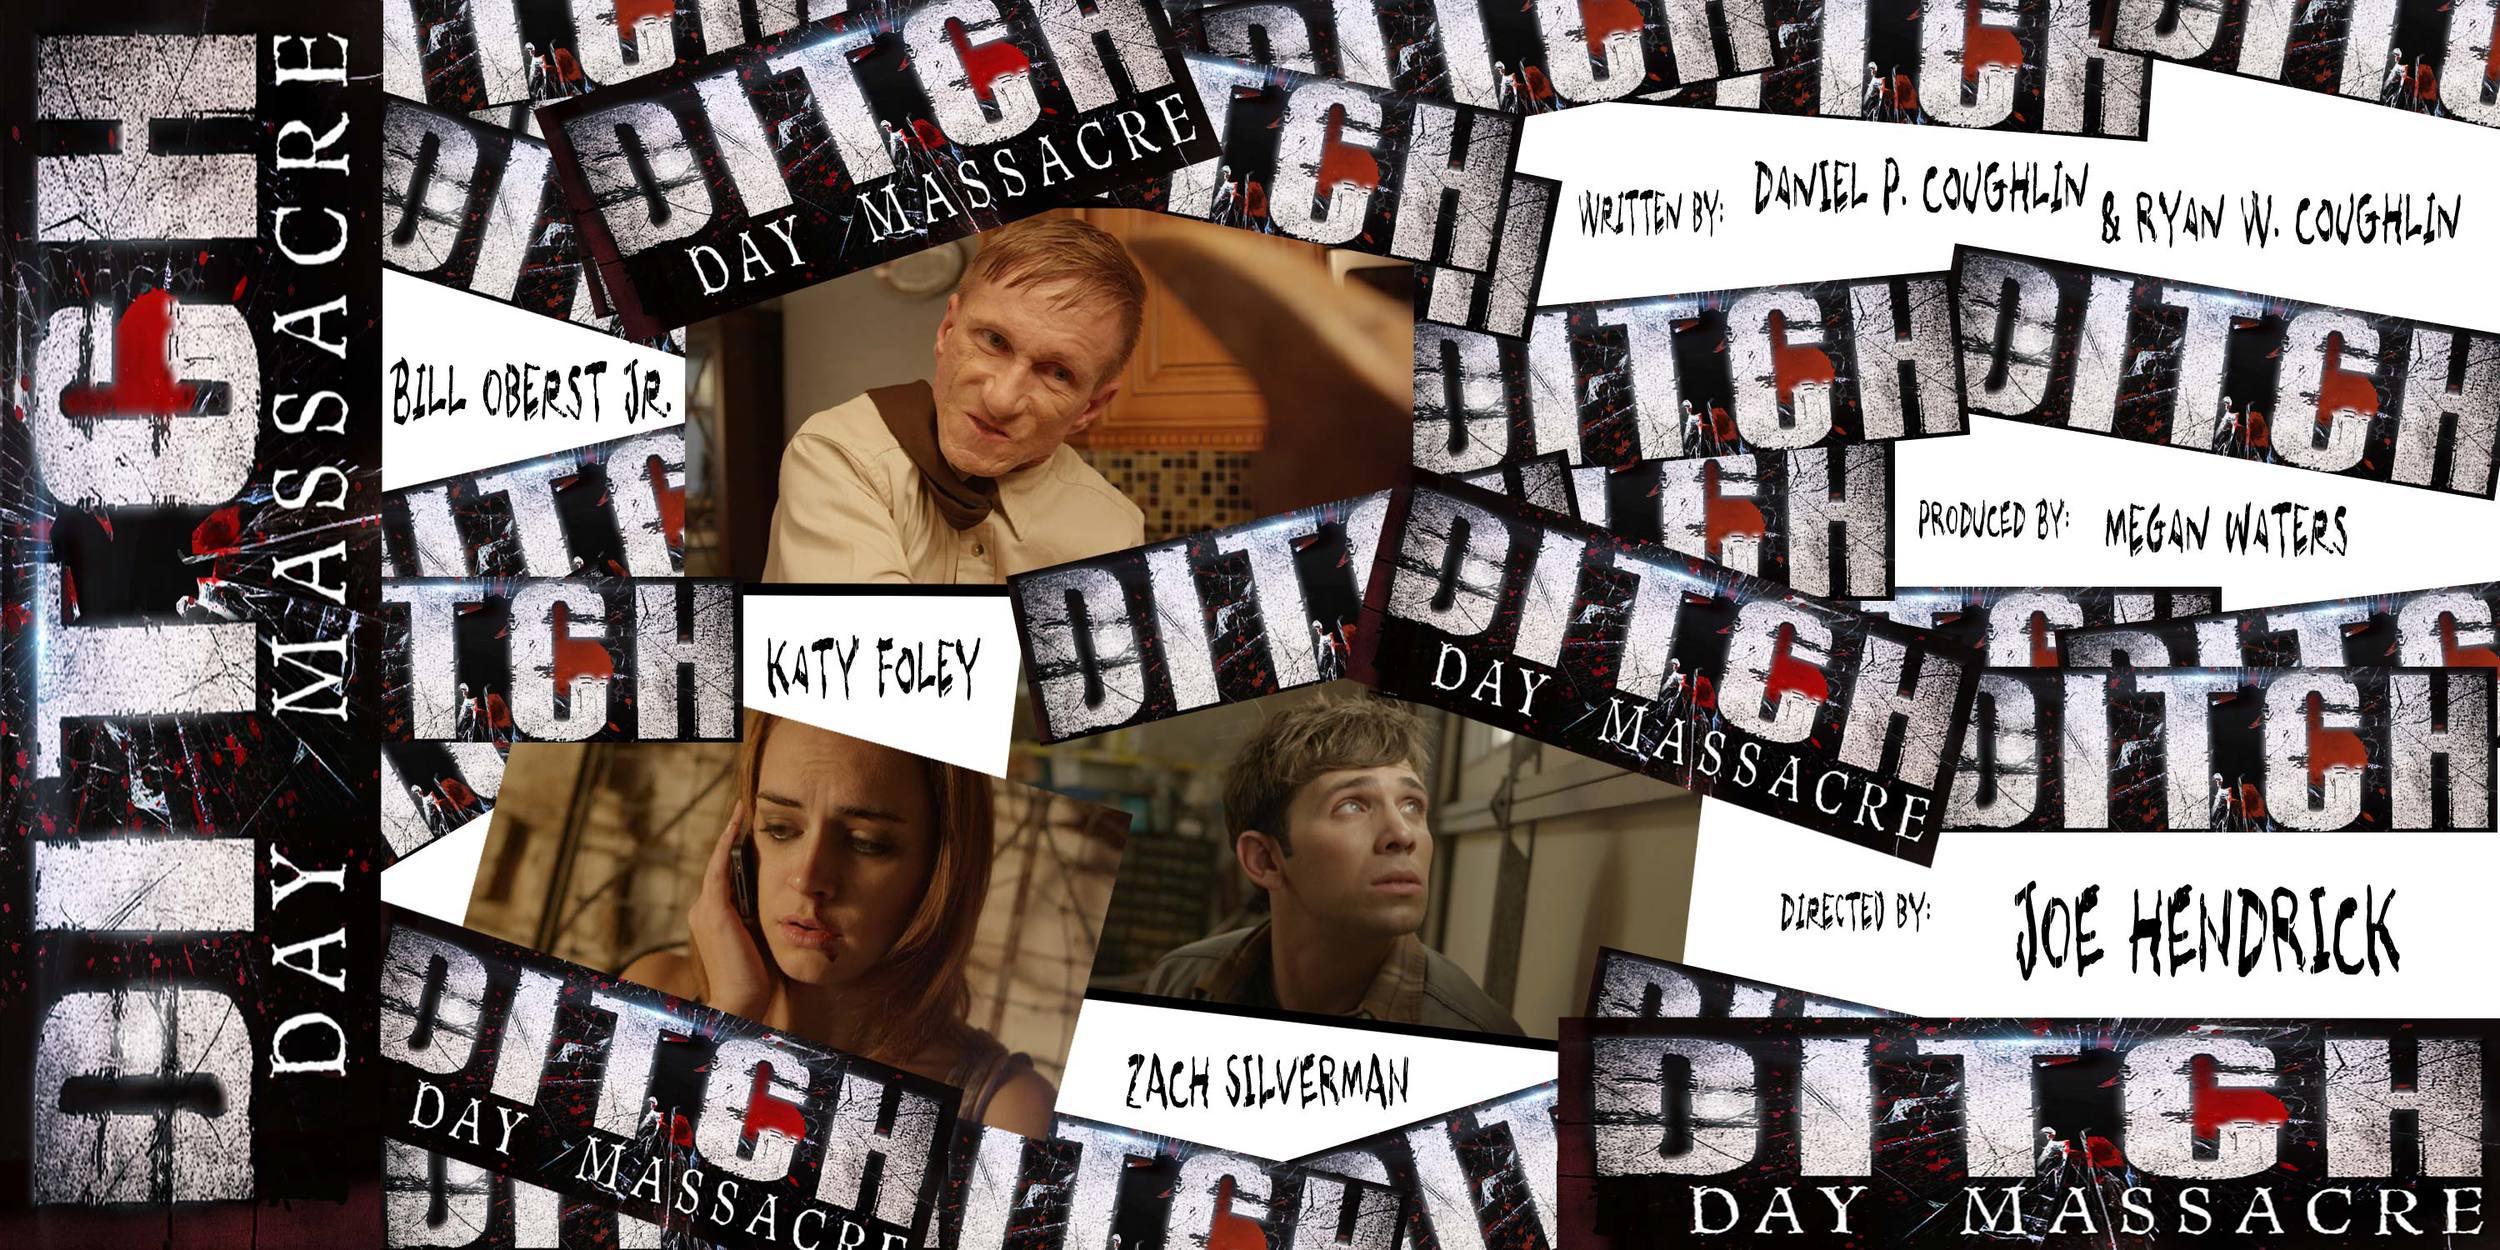 DITCH-DAY-MASSACRE-poster-revised.jpg